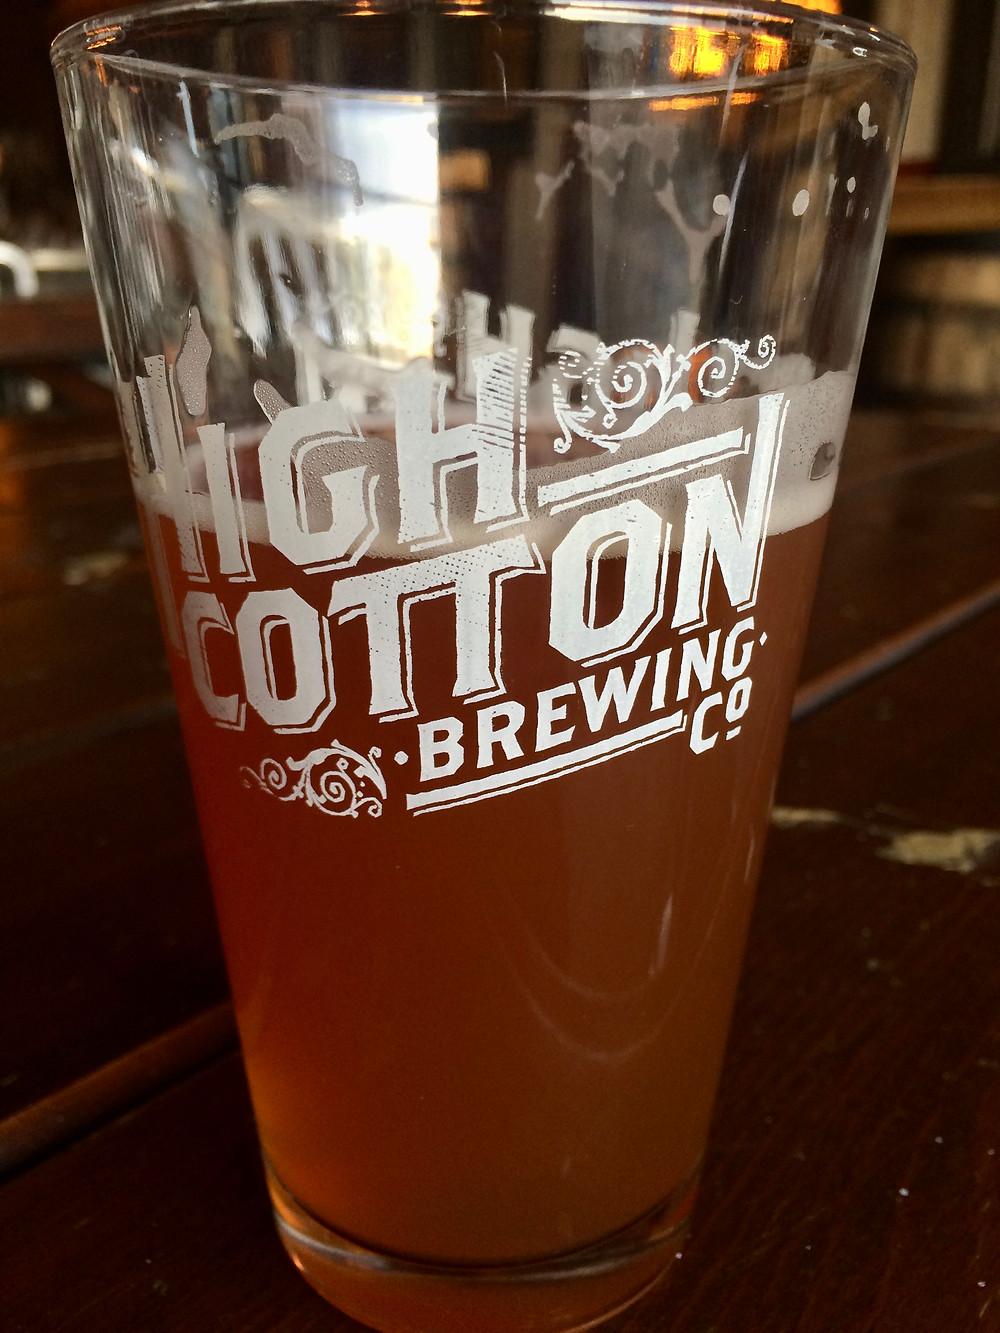 memphis-breweries-high-cotton